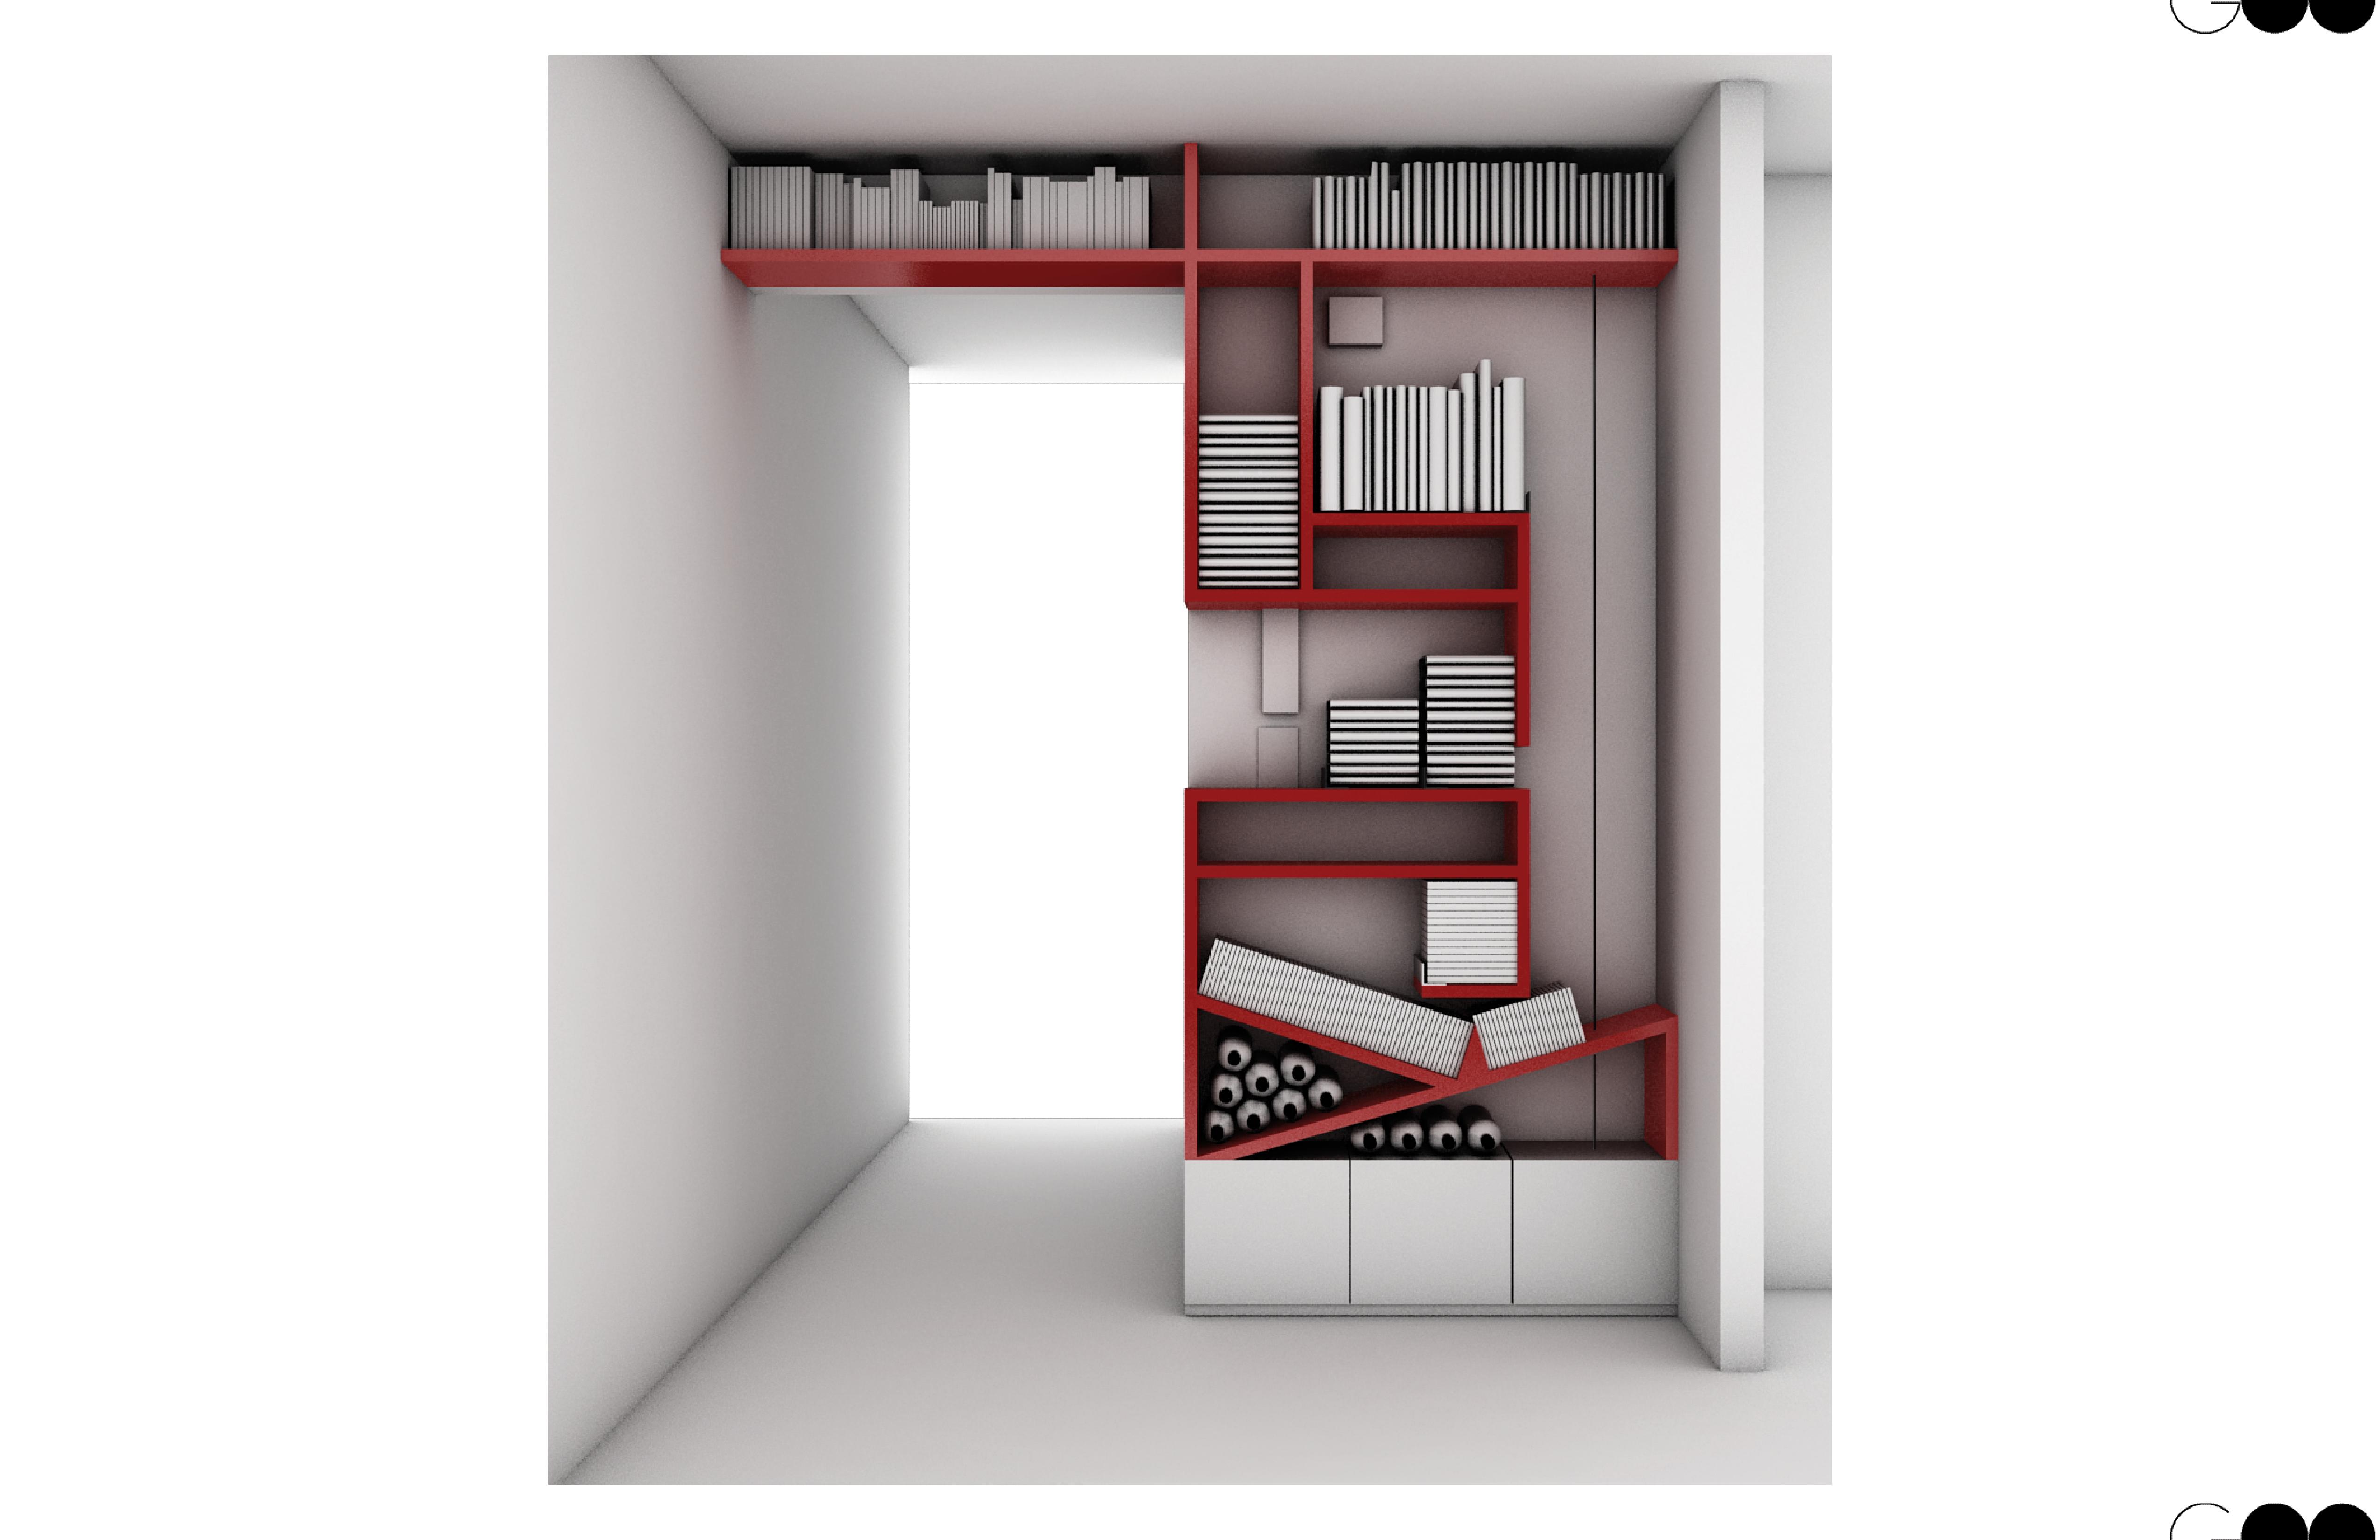 Librero perchero cava goo arquitectos - Muebles para cds madera ...